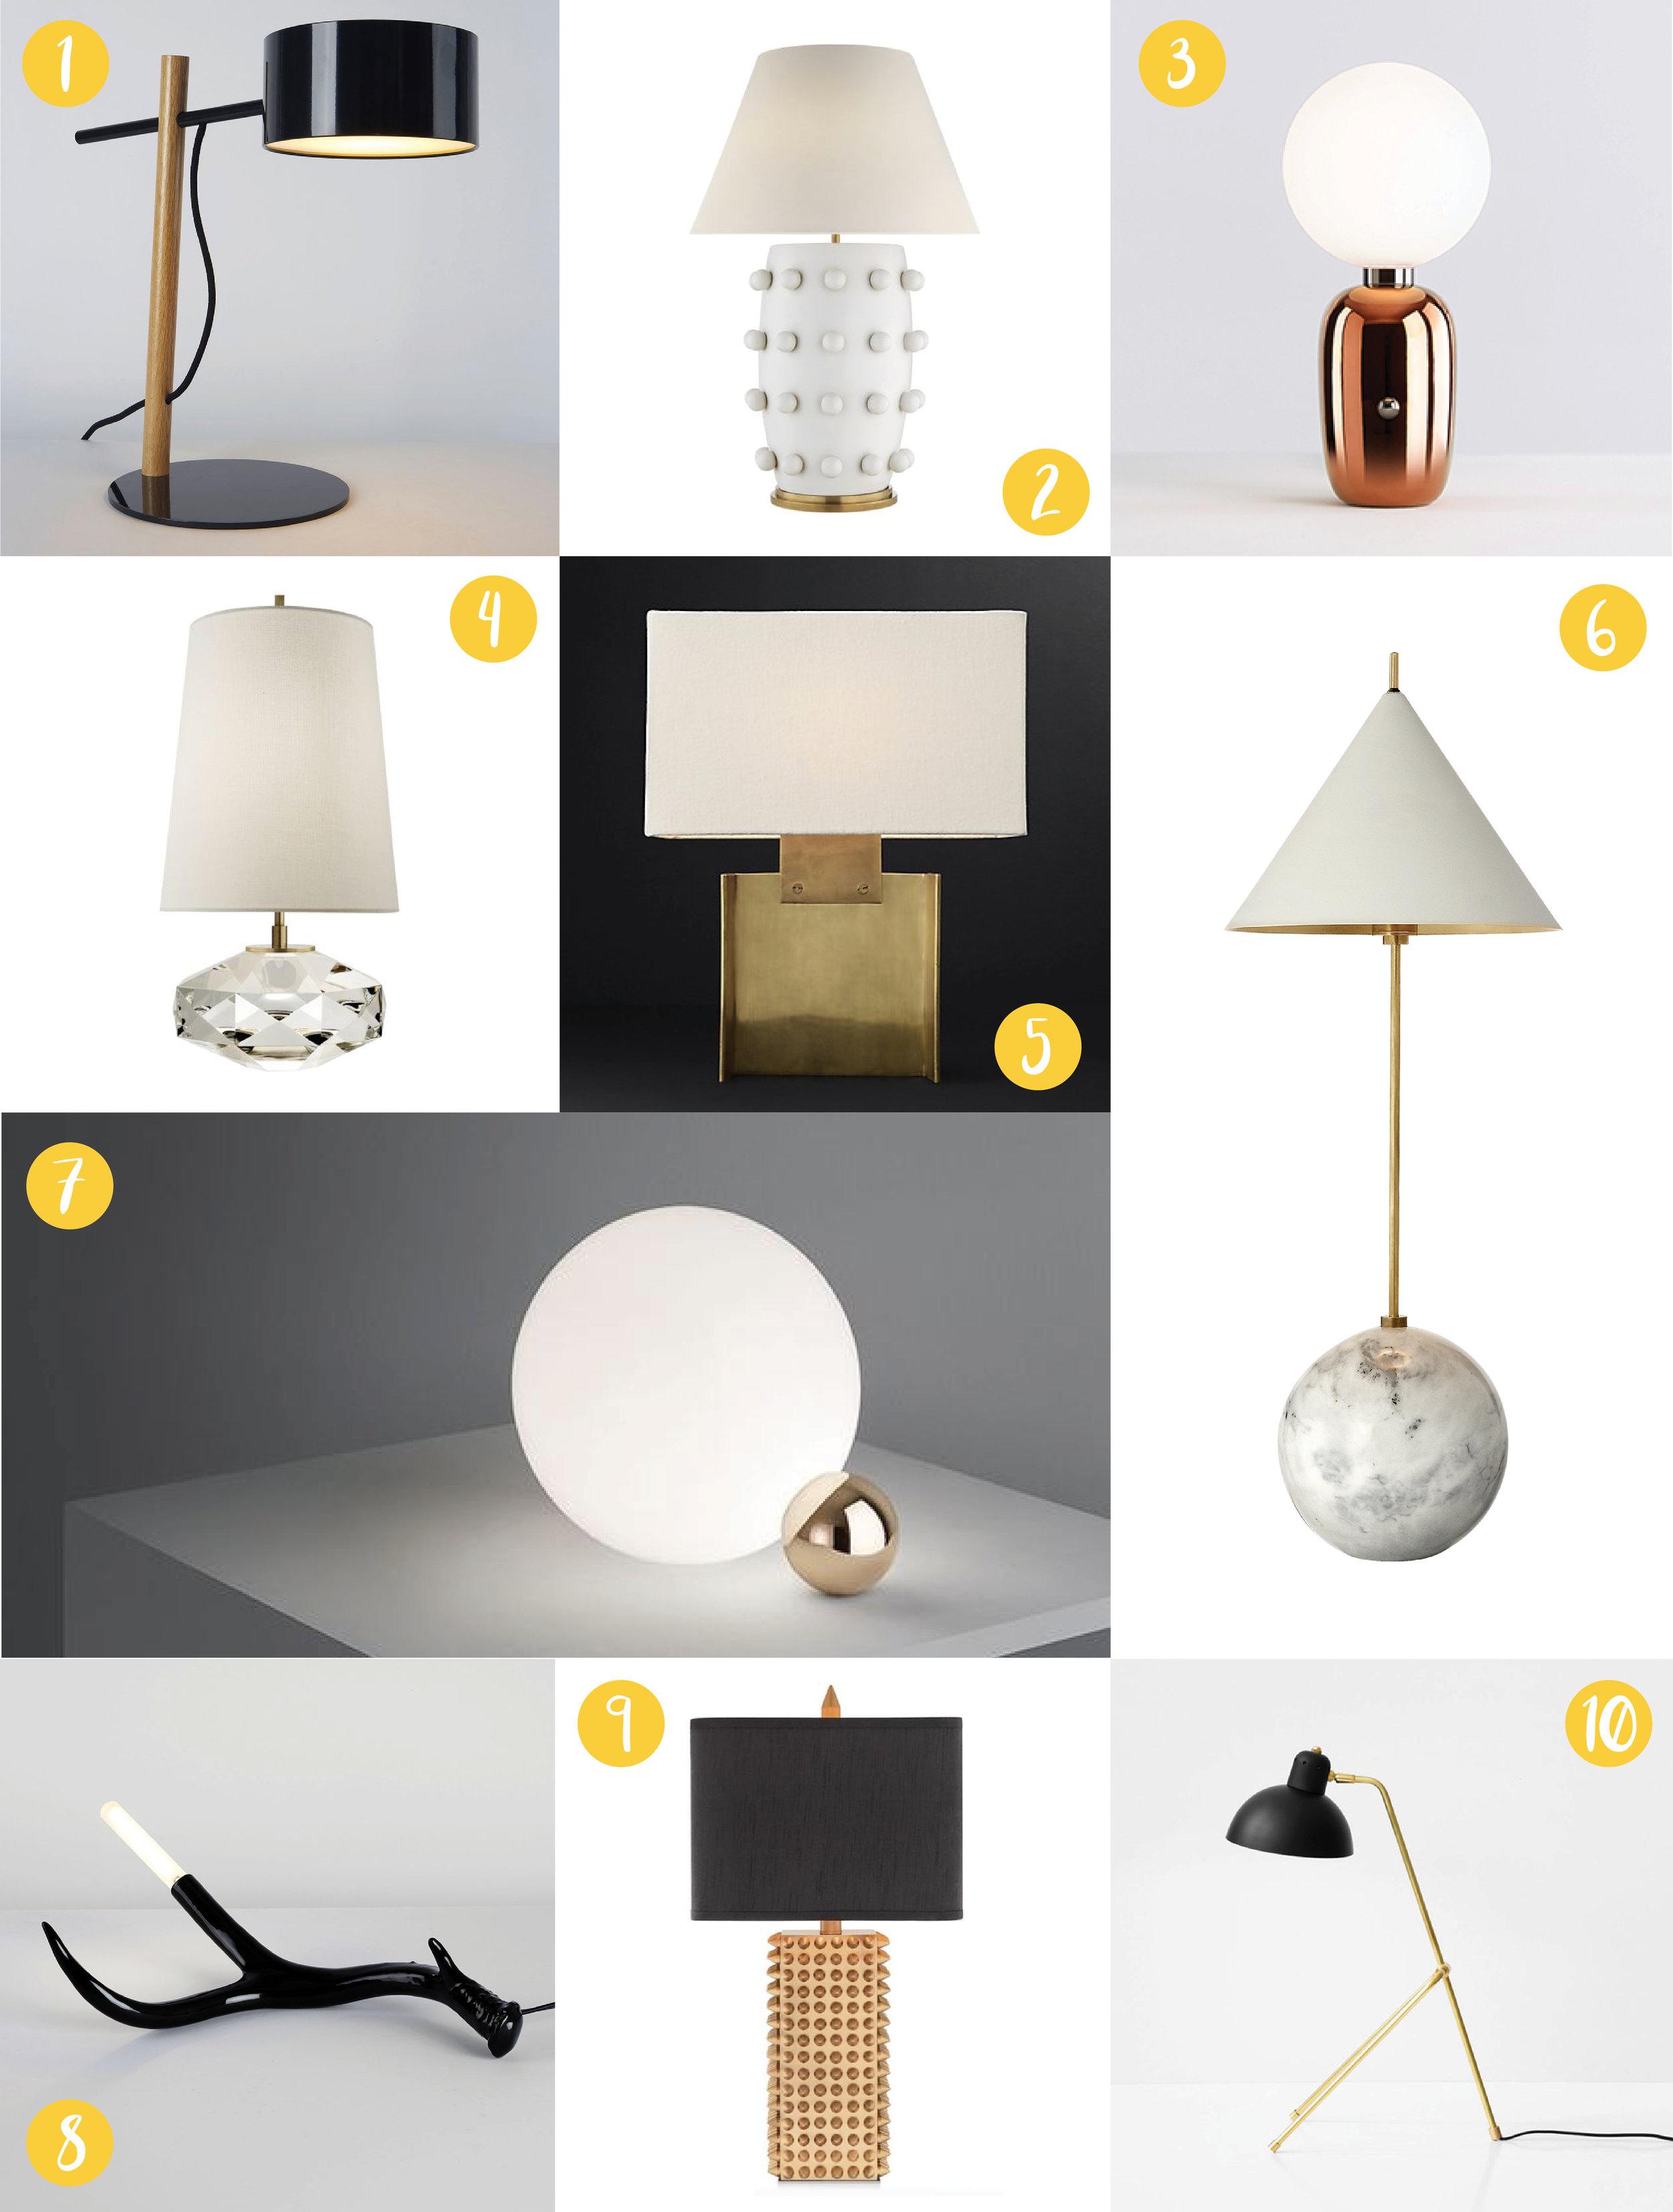 Top 10 Table Lamps, Nyla Free Designs Inc., Calgary Interior Designer